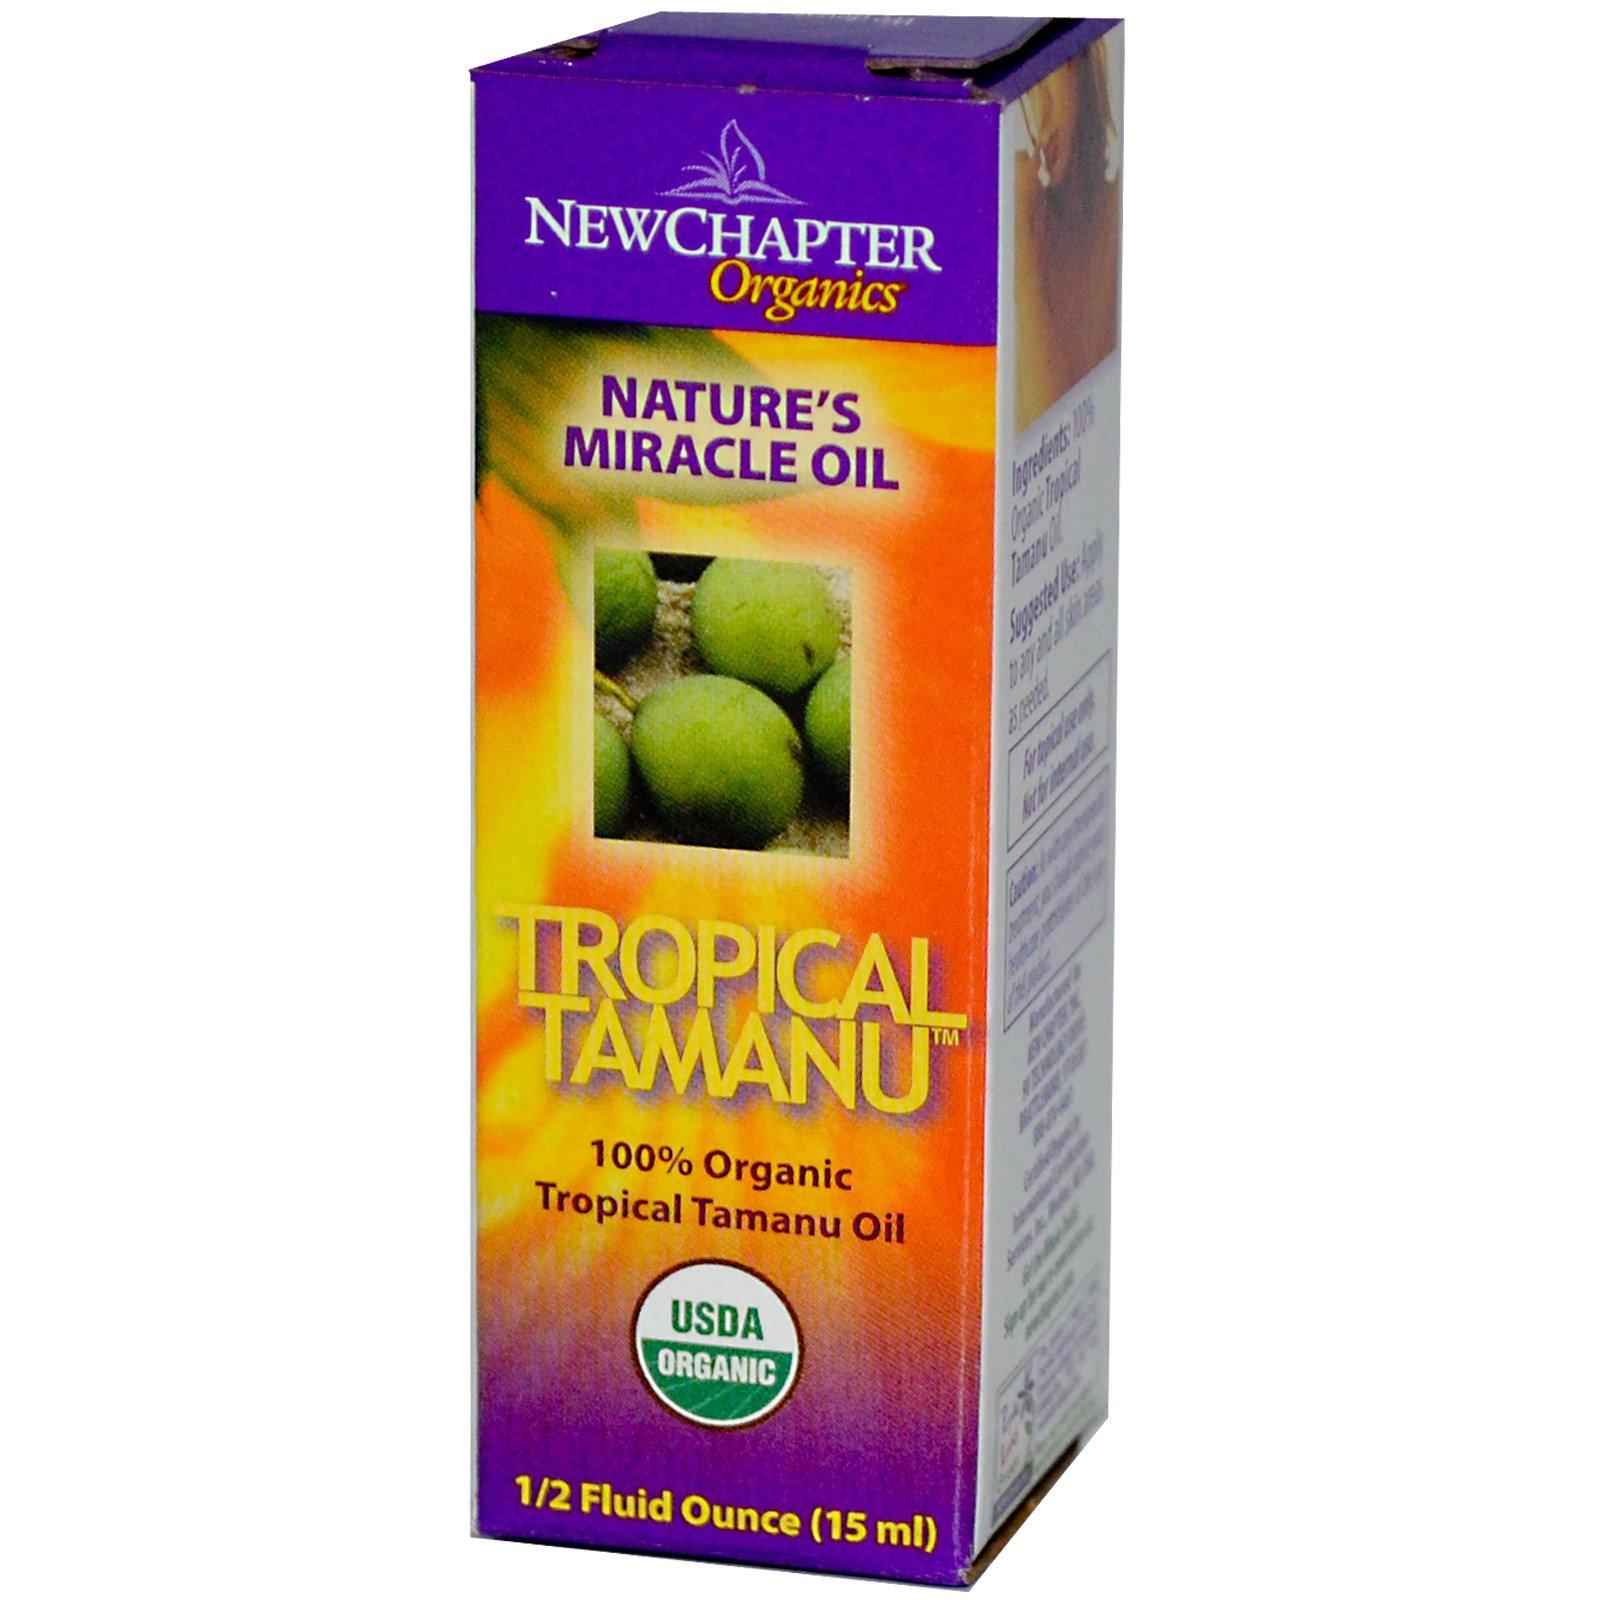 New Chapter, Organics, Tropical Tamanu, 1/2 fl oz (15 ml